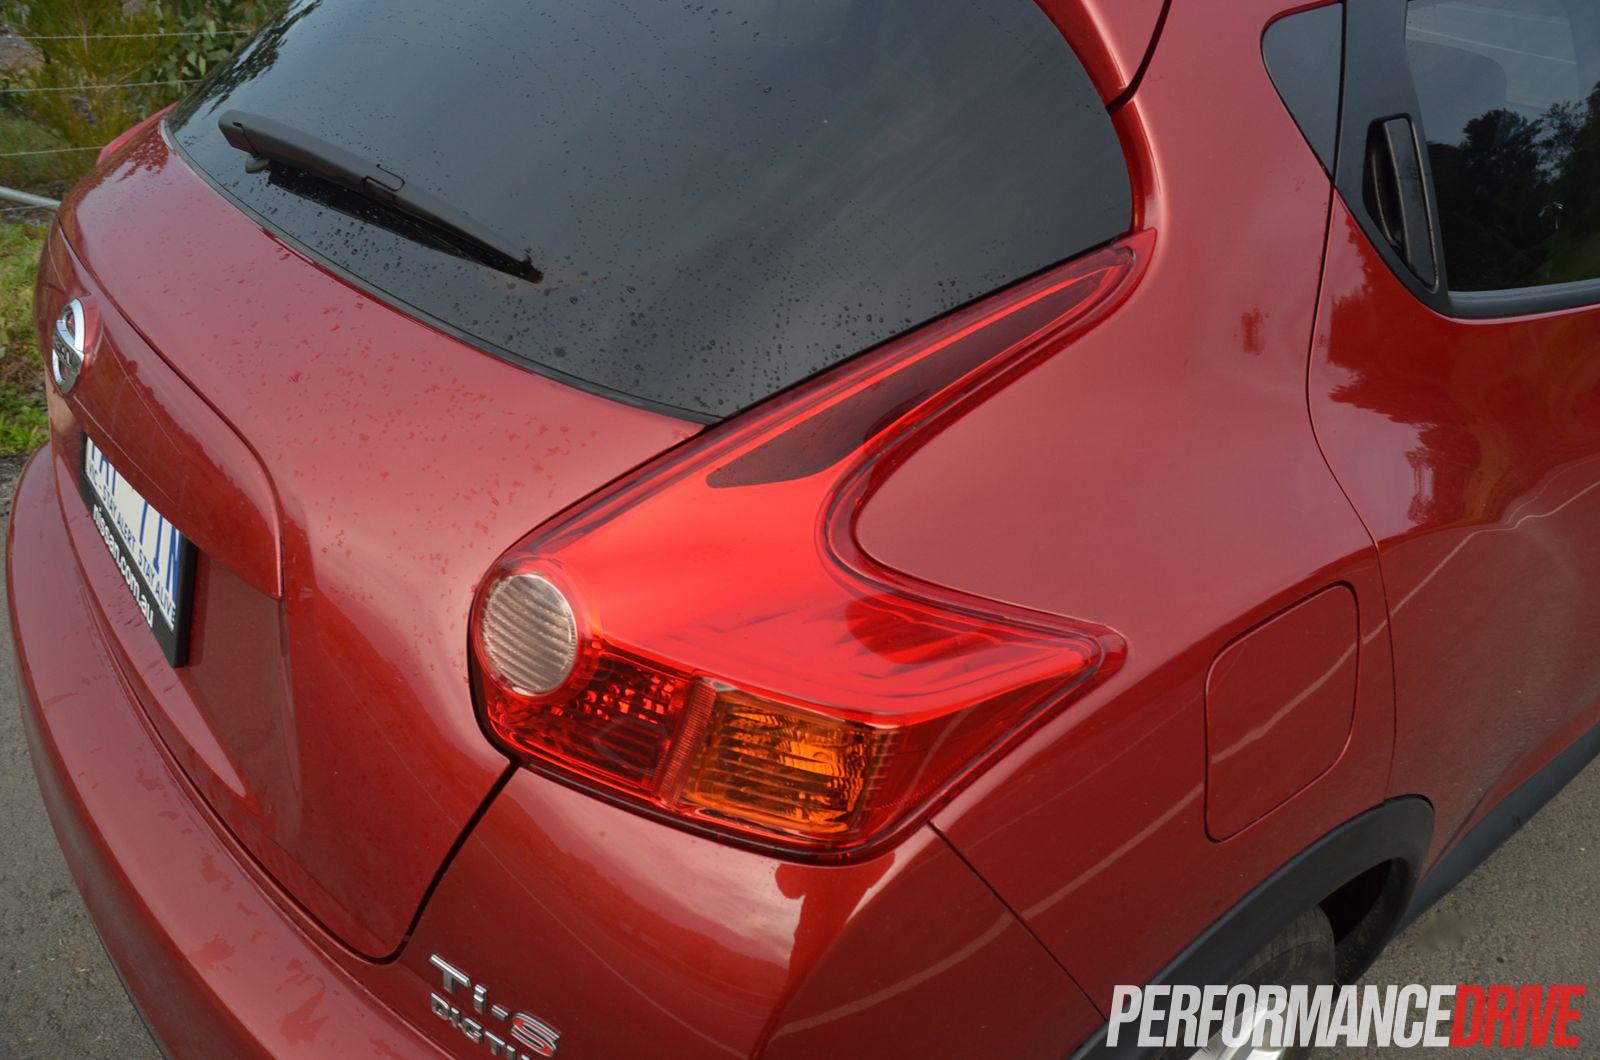 2014 Nissan Juke Ti-S – THE COMPETITORS